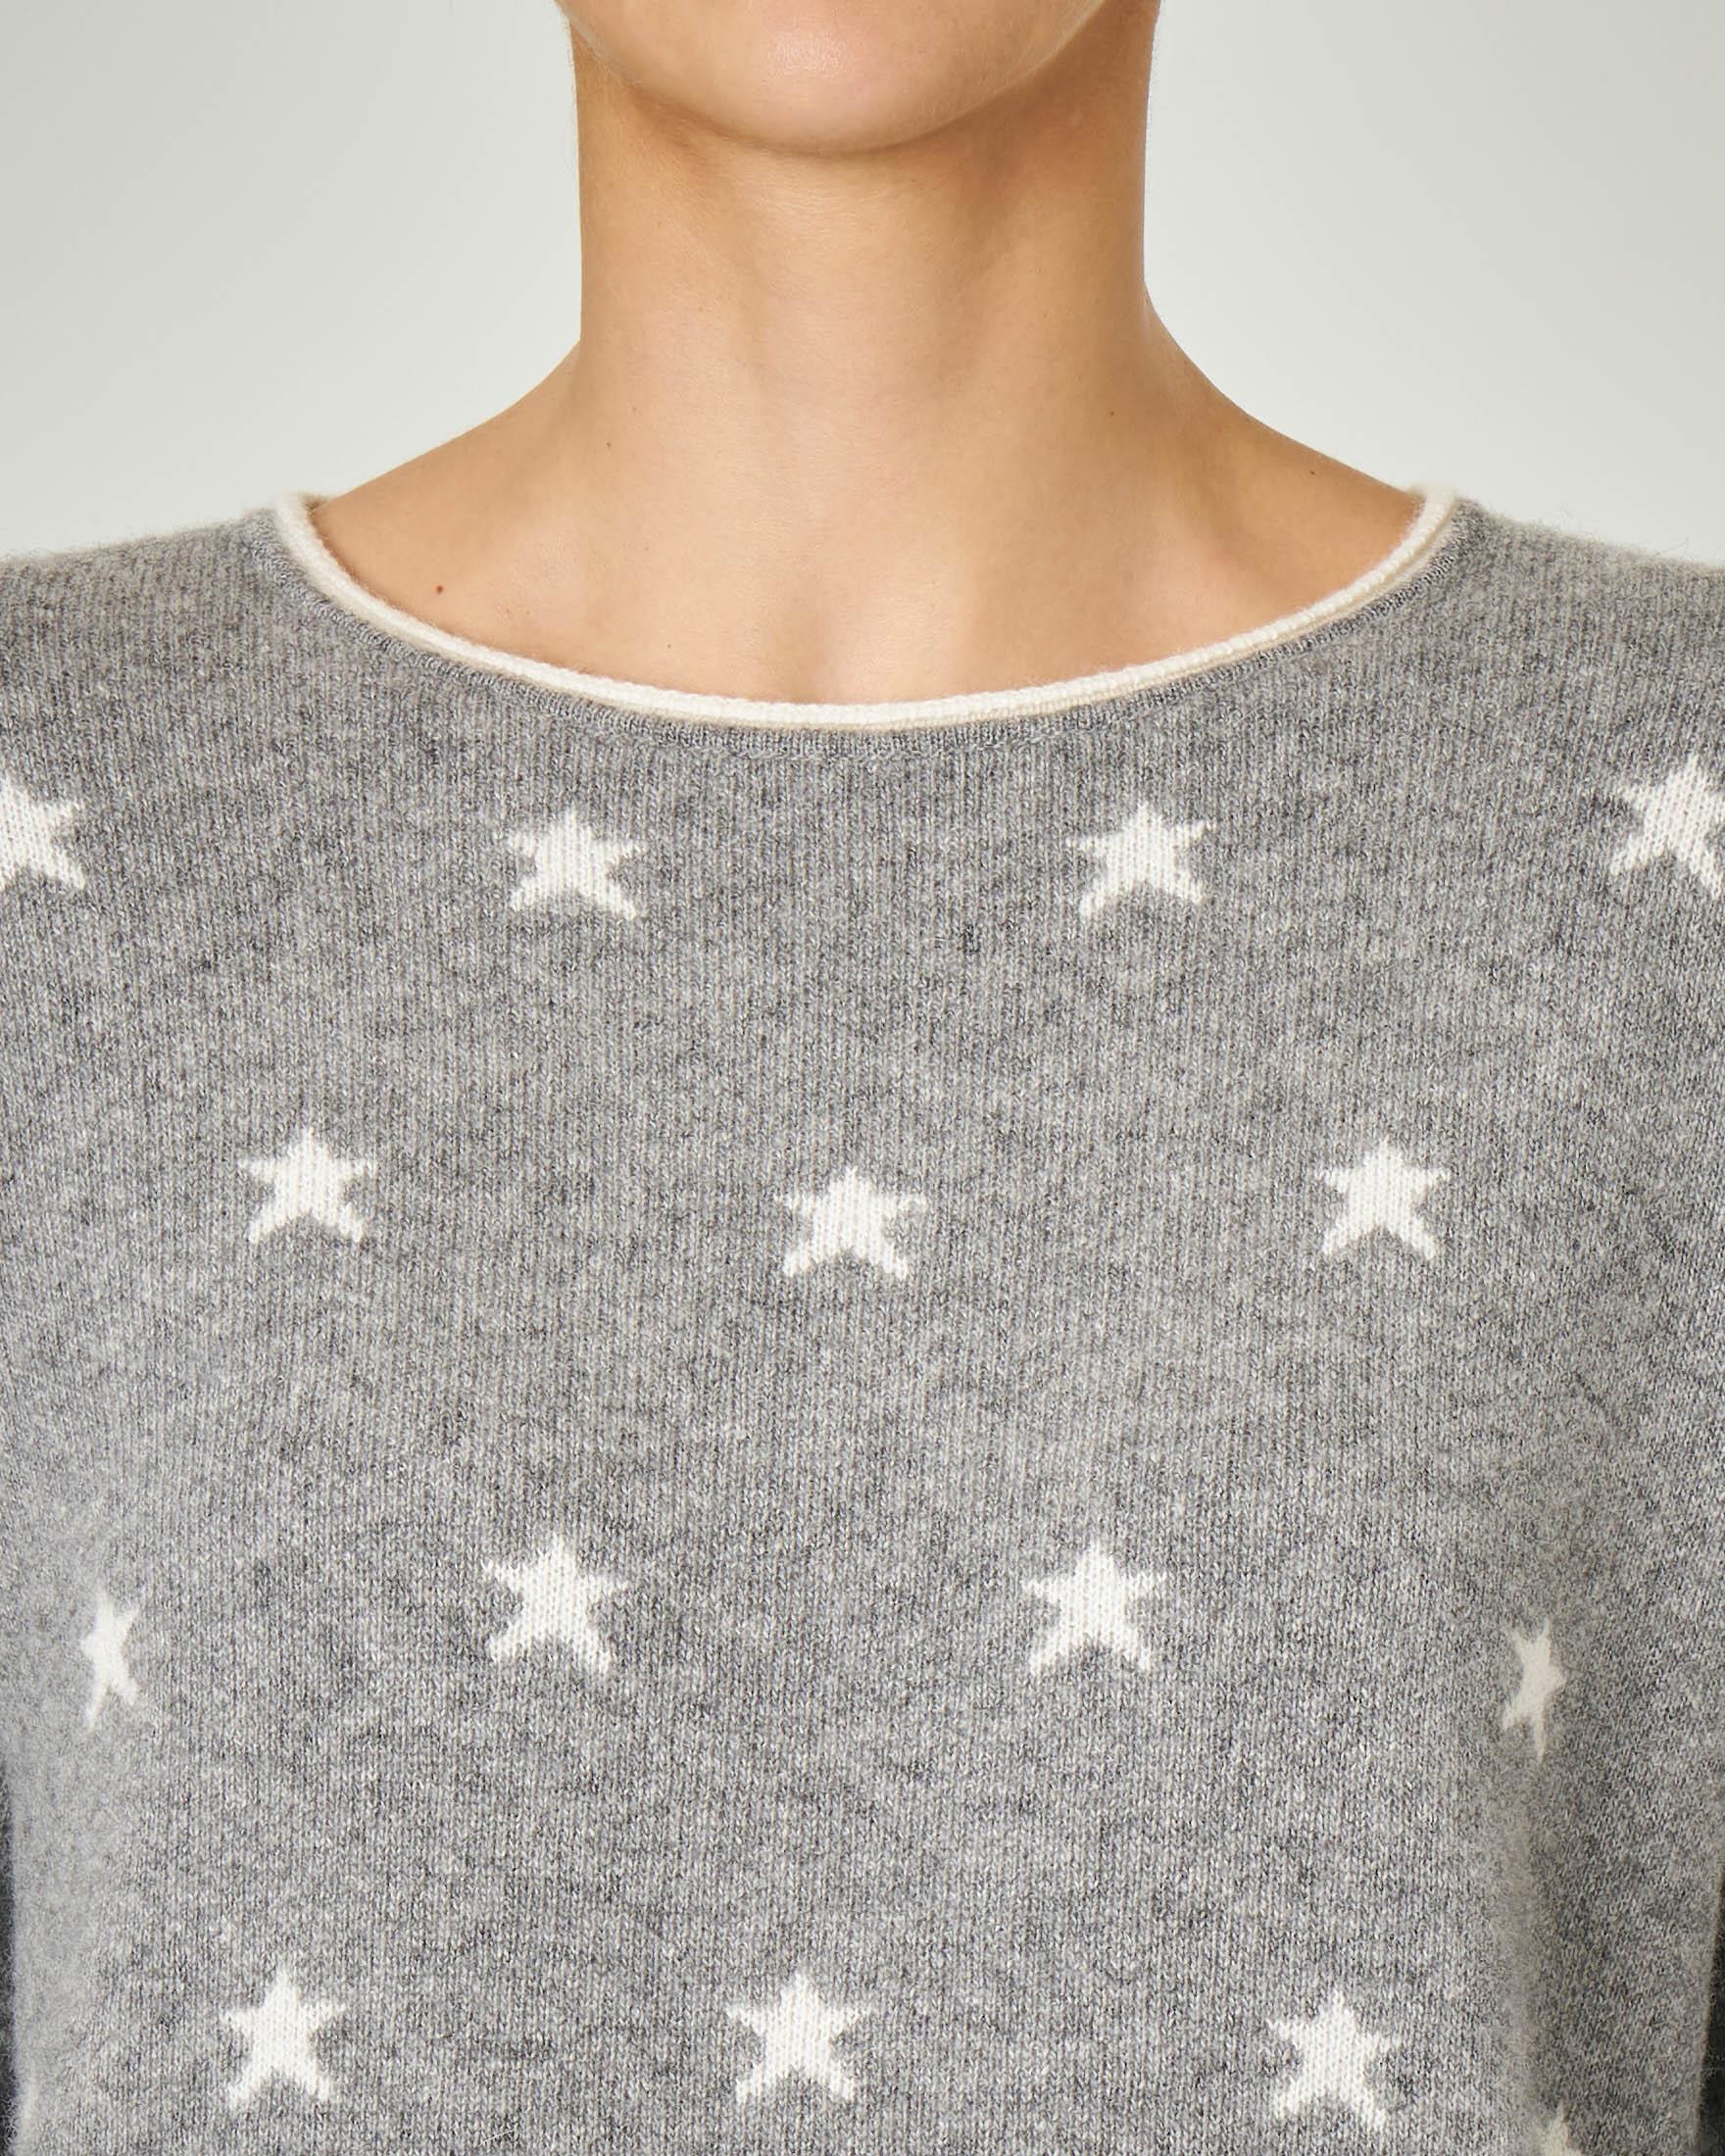 Maglia in misto lana e cashmere grigia a fantasia a stelle jacquard